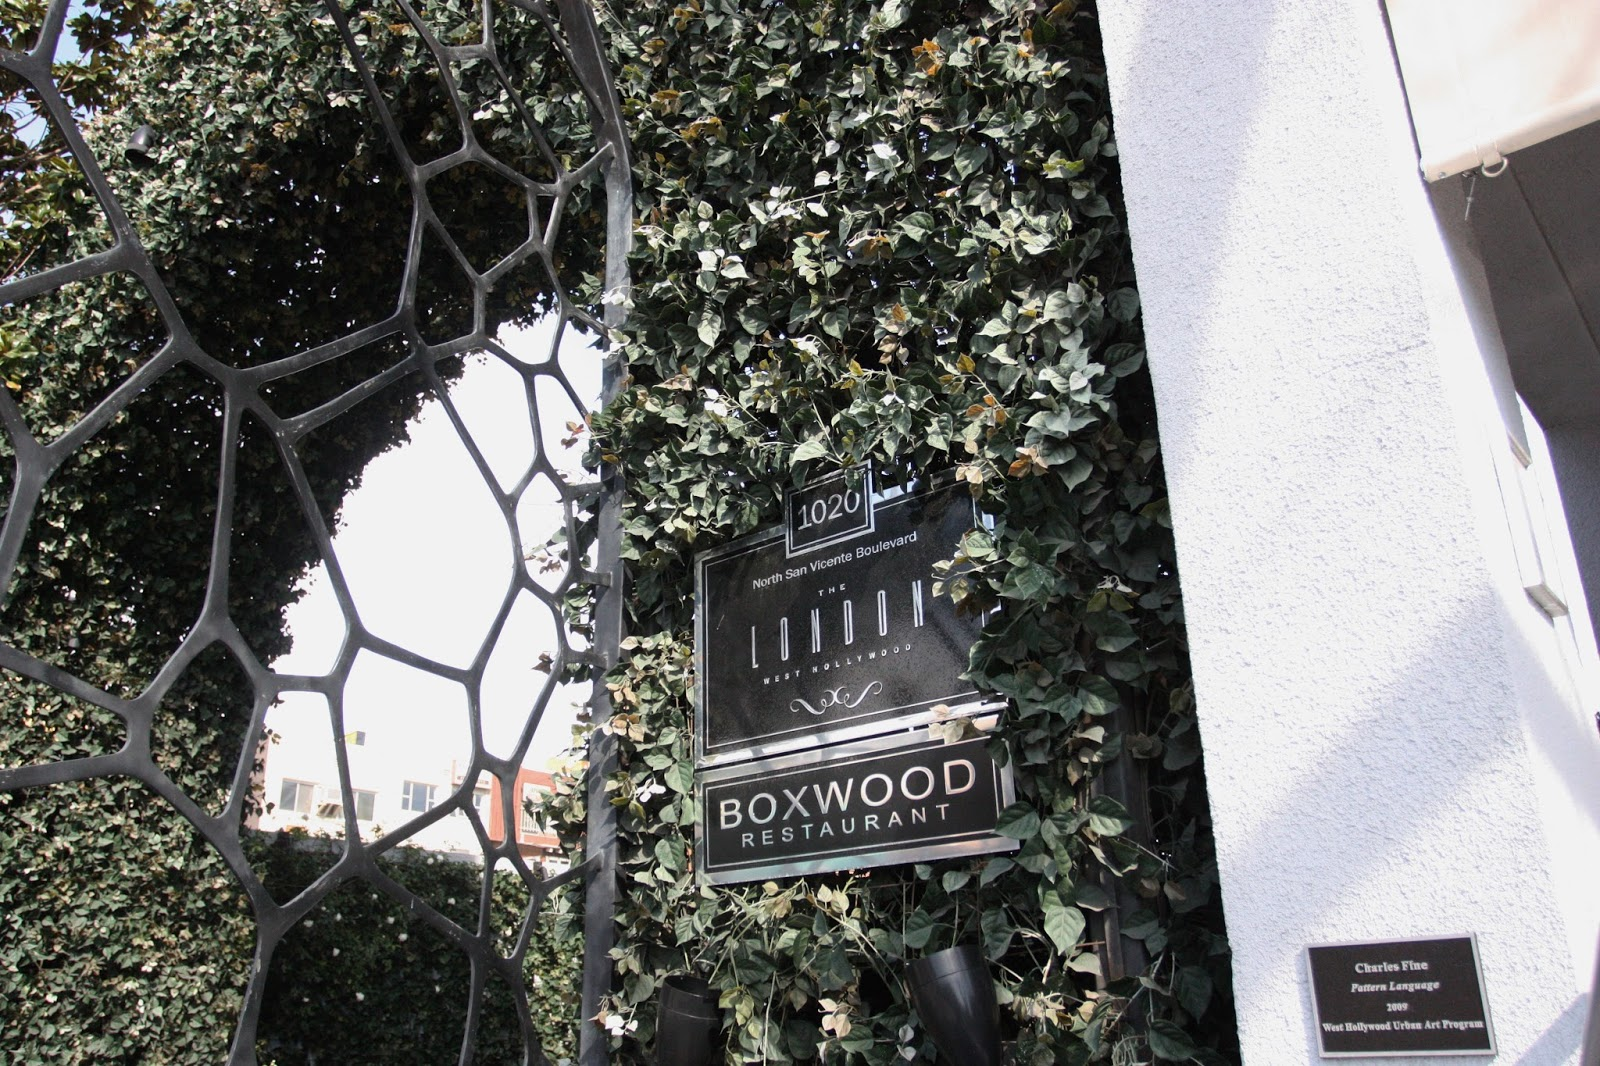 Boxwood at the London